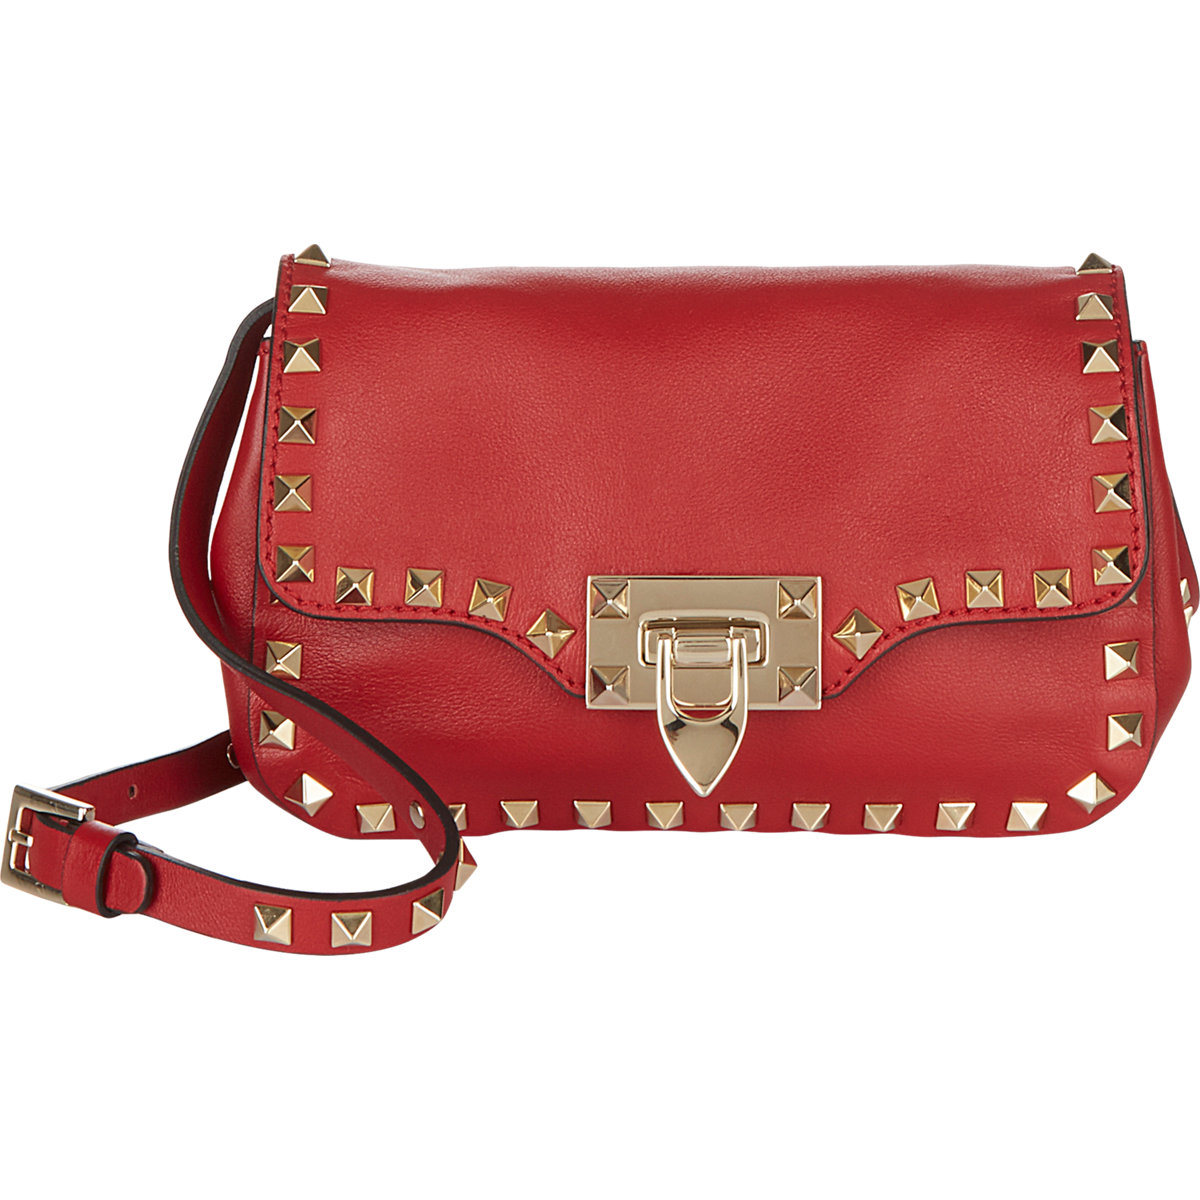 96d85d37f663 Valentino Garavani Rockstud Crossbody Bag Red